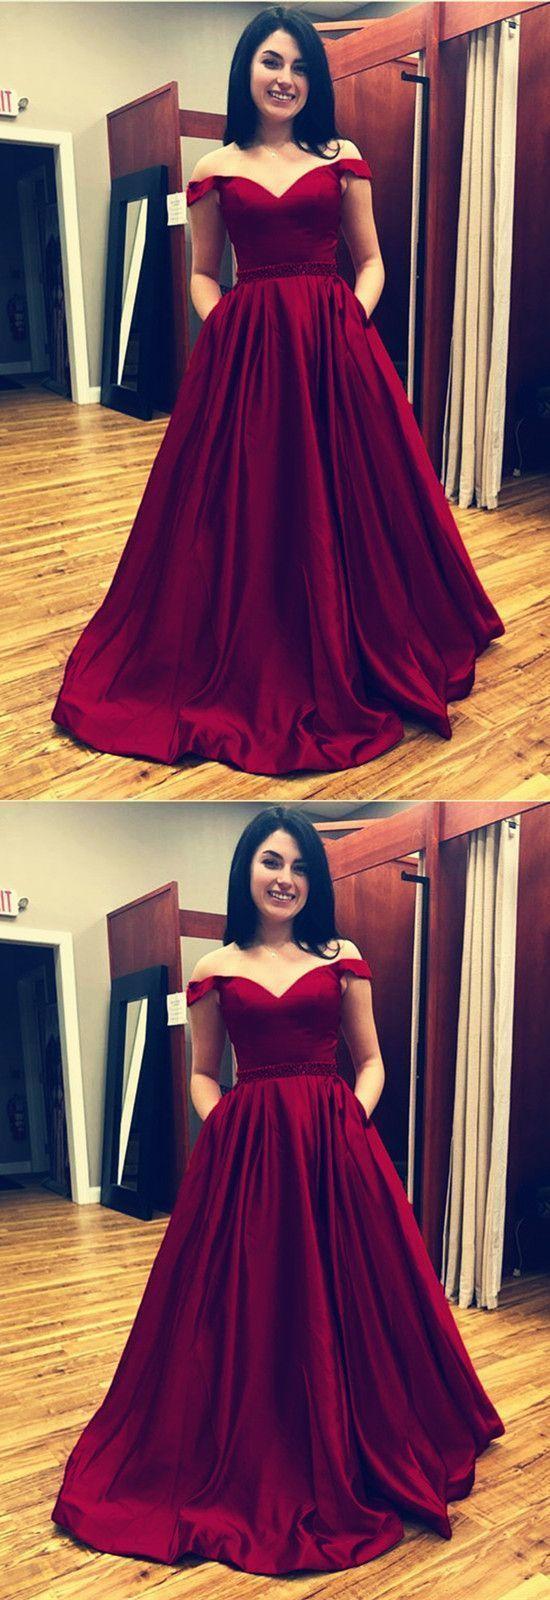 Off the shoulder prom dresses ball gowns vneck evening dresses